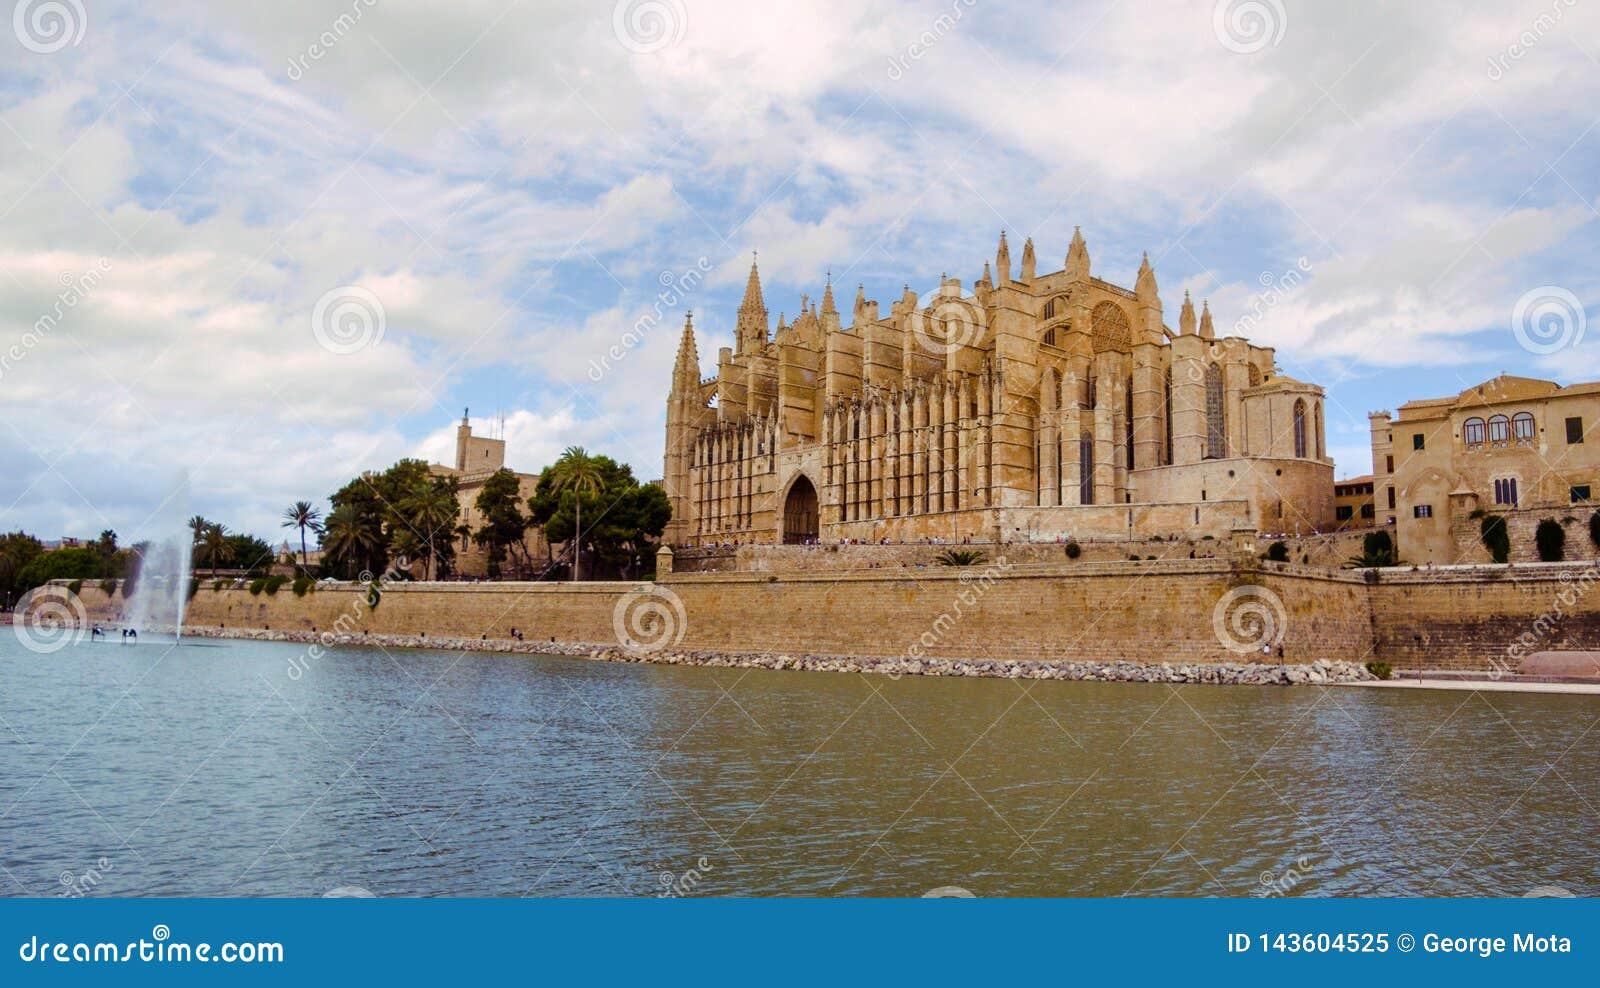 Berömd domkyrkaLa Seu i Palma de Mallorca, Spanien